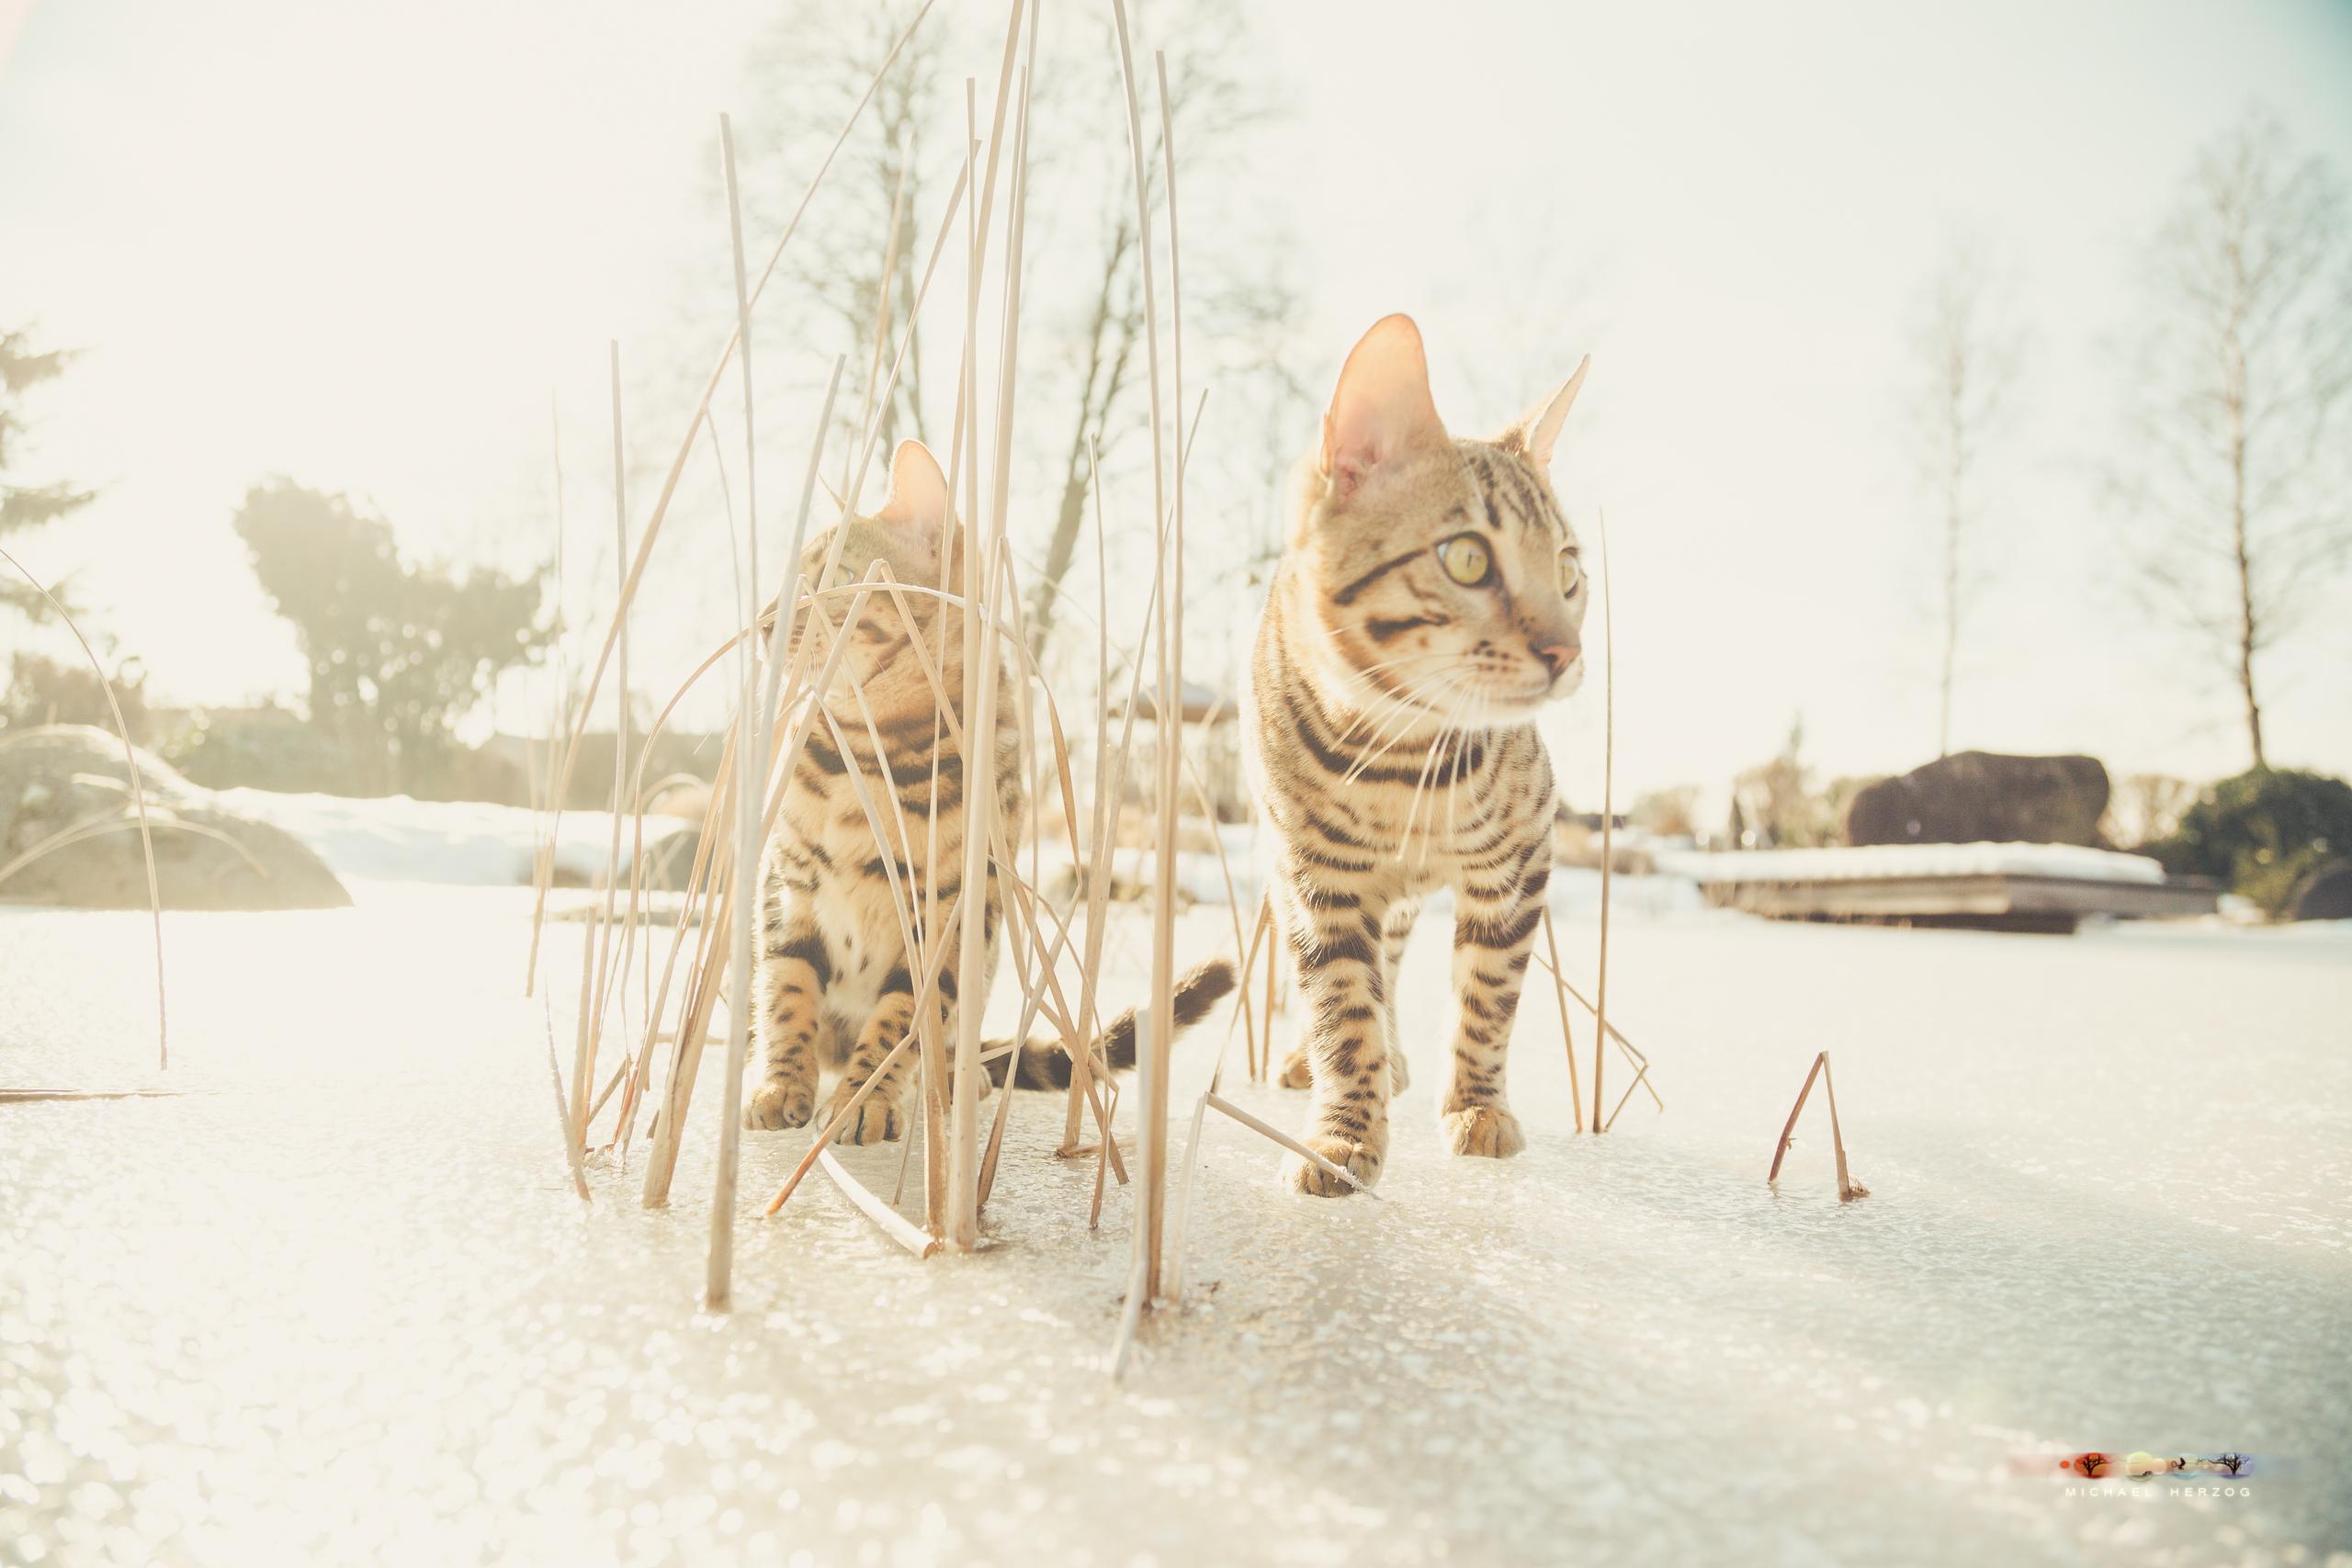 BALUARI_Winter2019_Garten_MichaelHerzog-8802.jpg